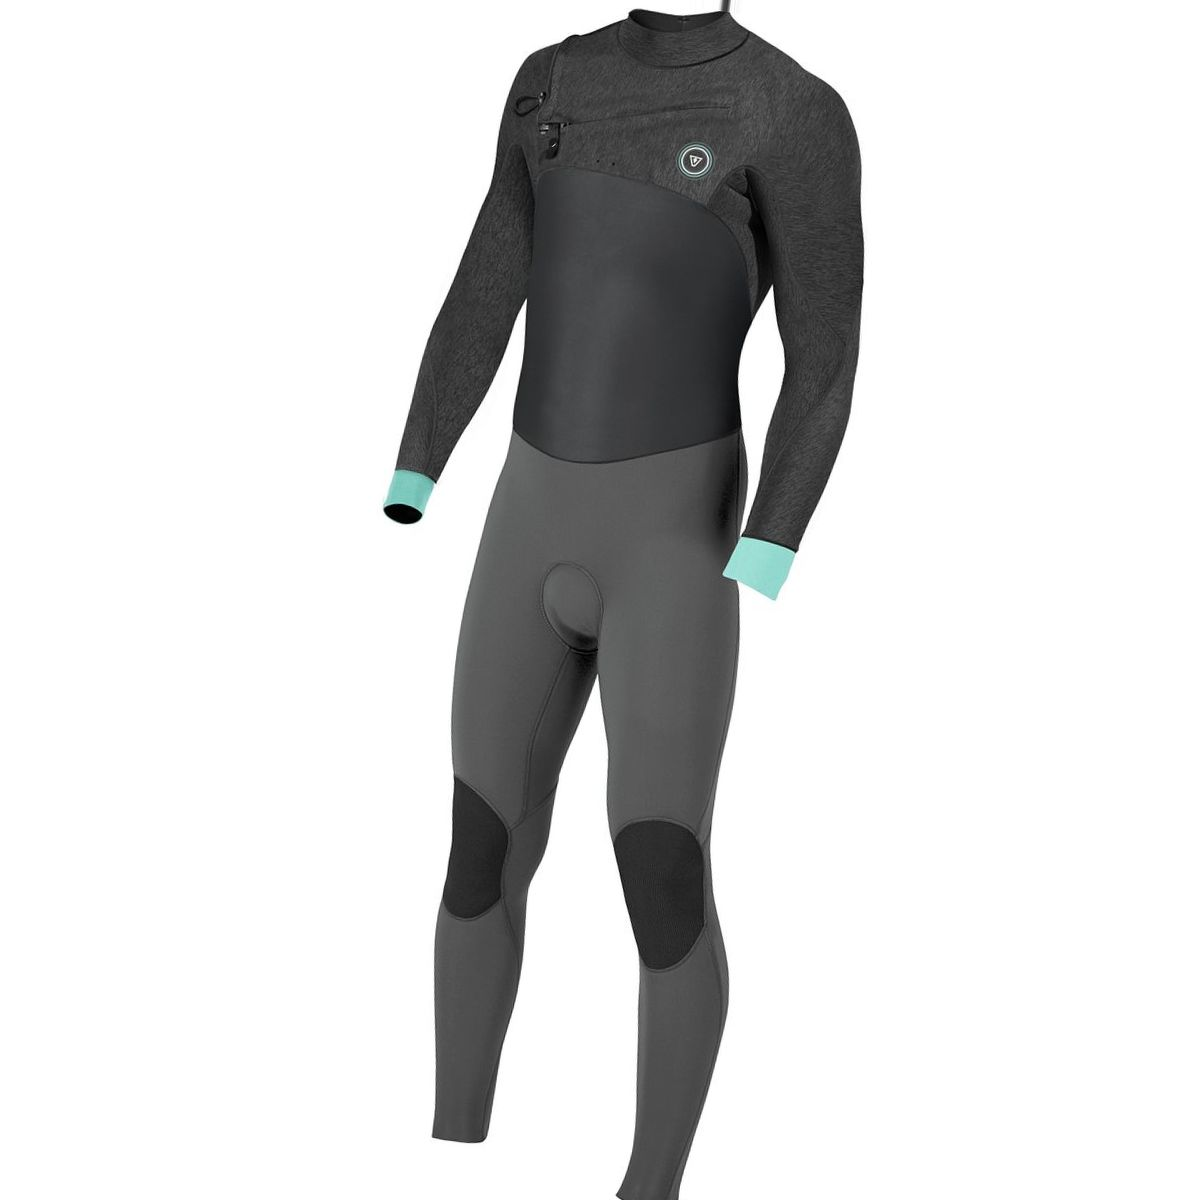 Vissla The 7 Seas 50/50 3/2 Long-Sleeve Wetsuit - Men's